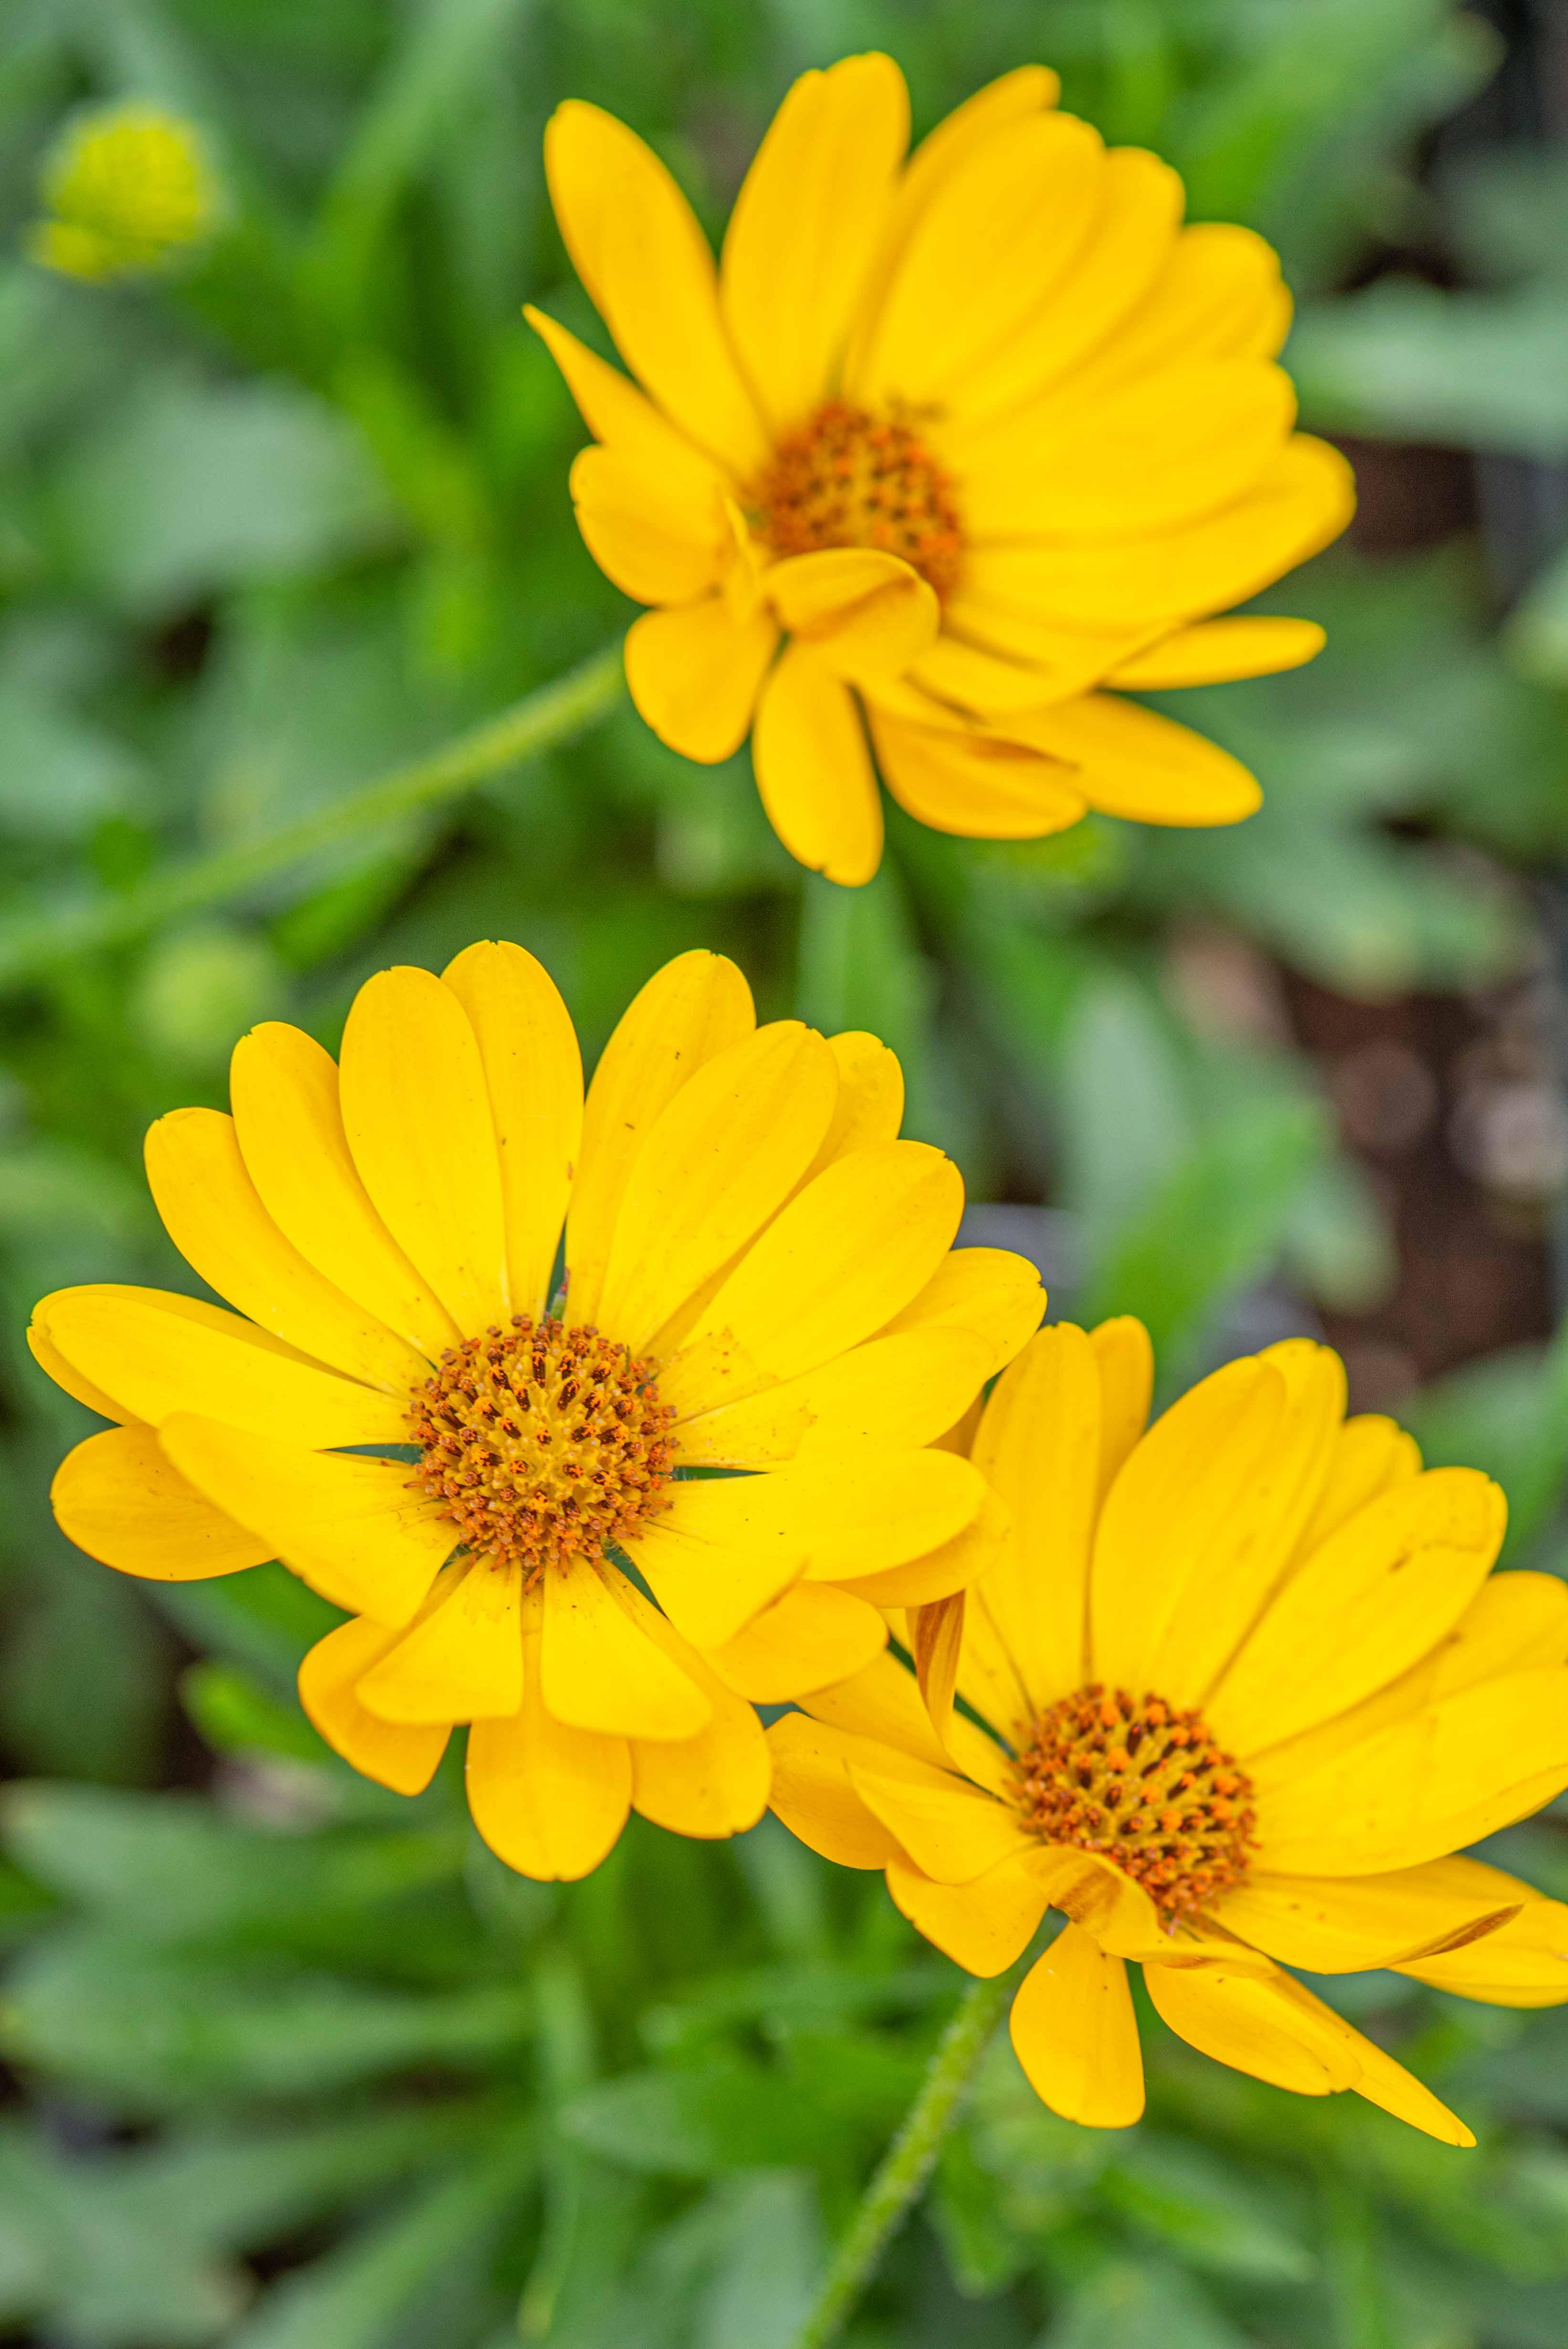 Osteospermum 'Tradewinds Yellow' Annual, full sun, African Daisy